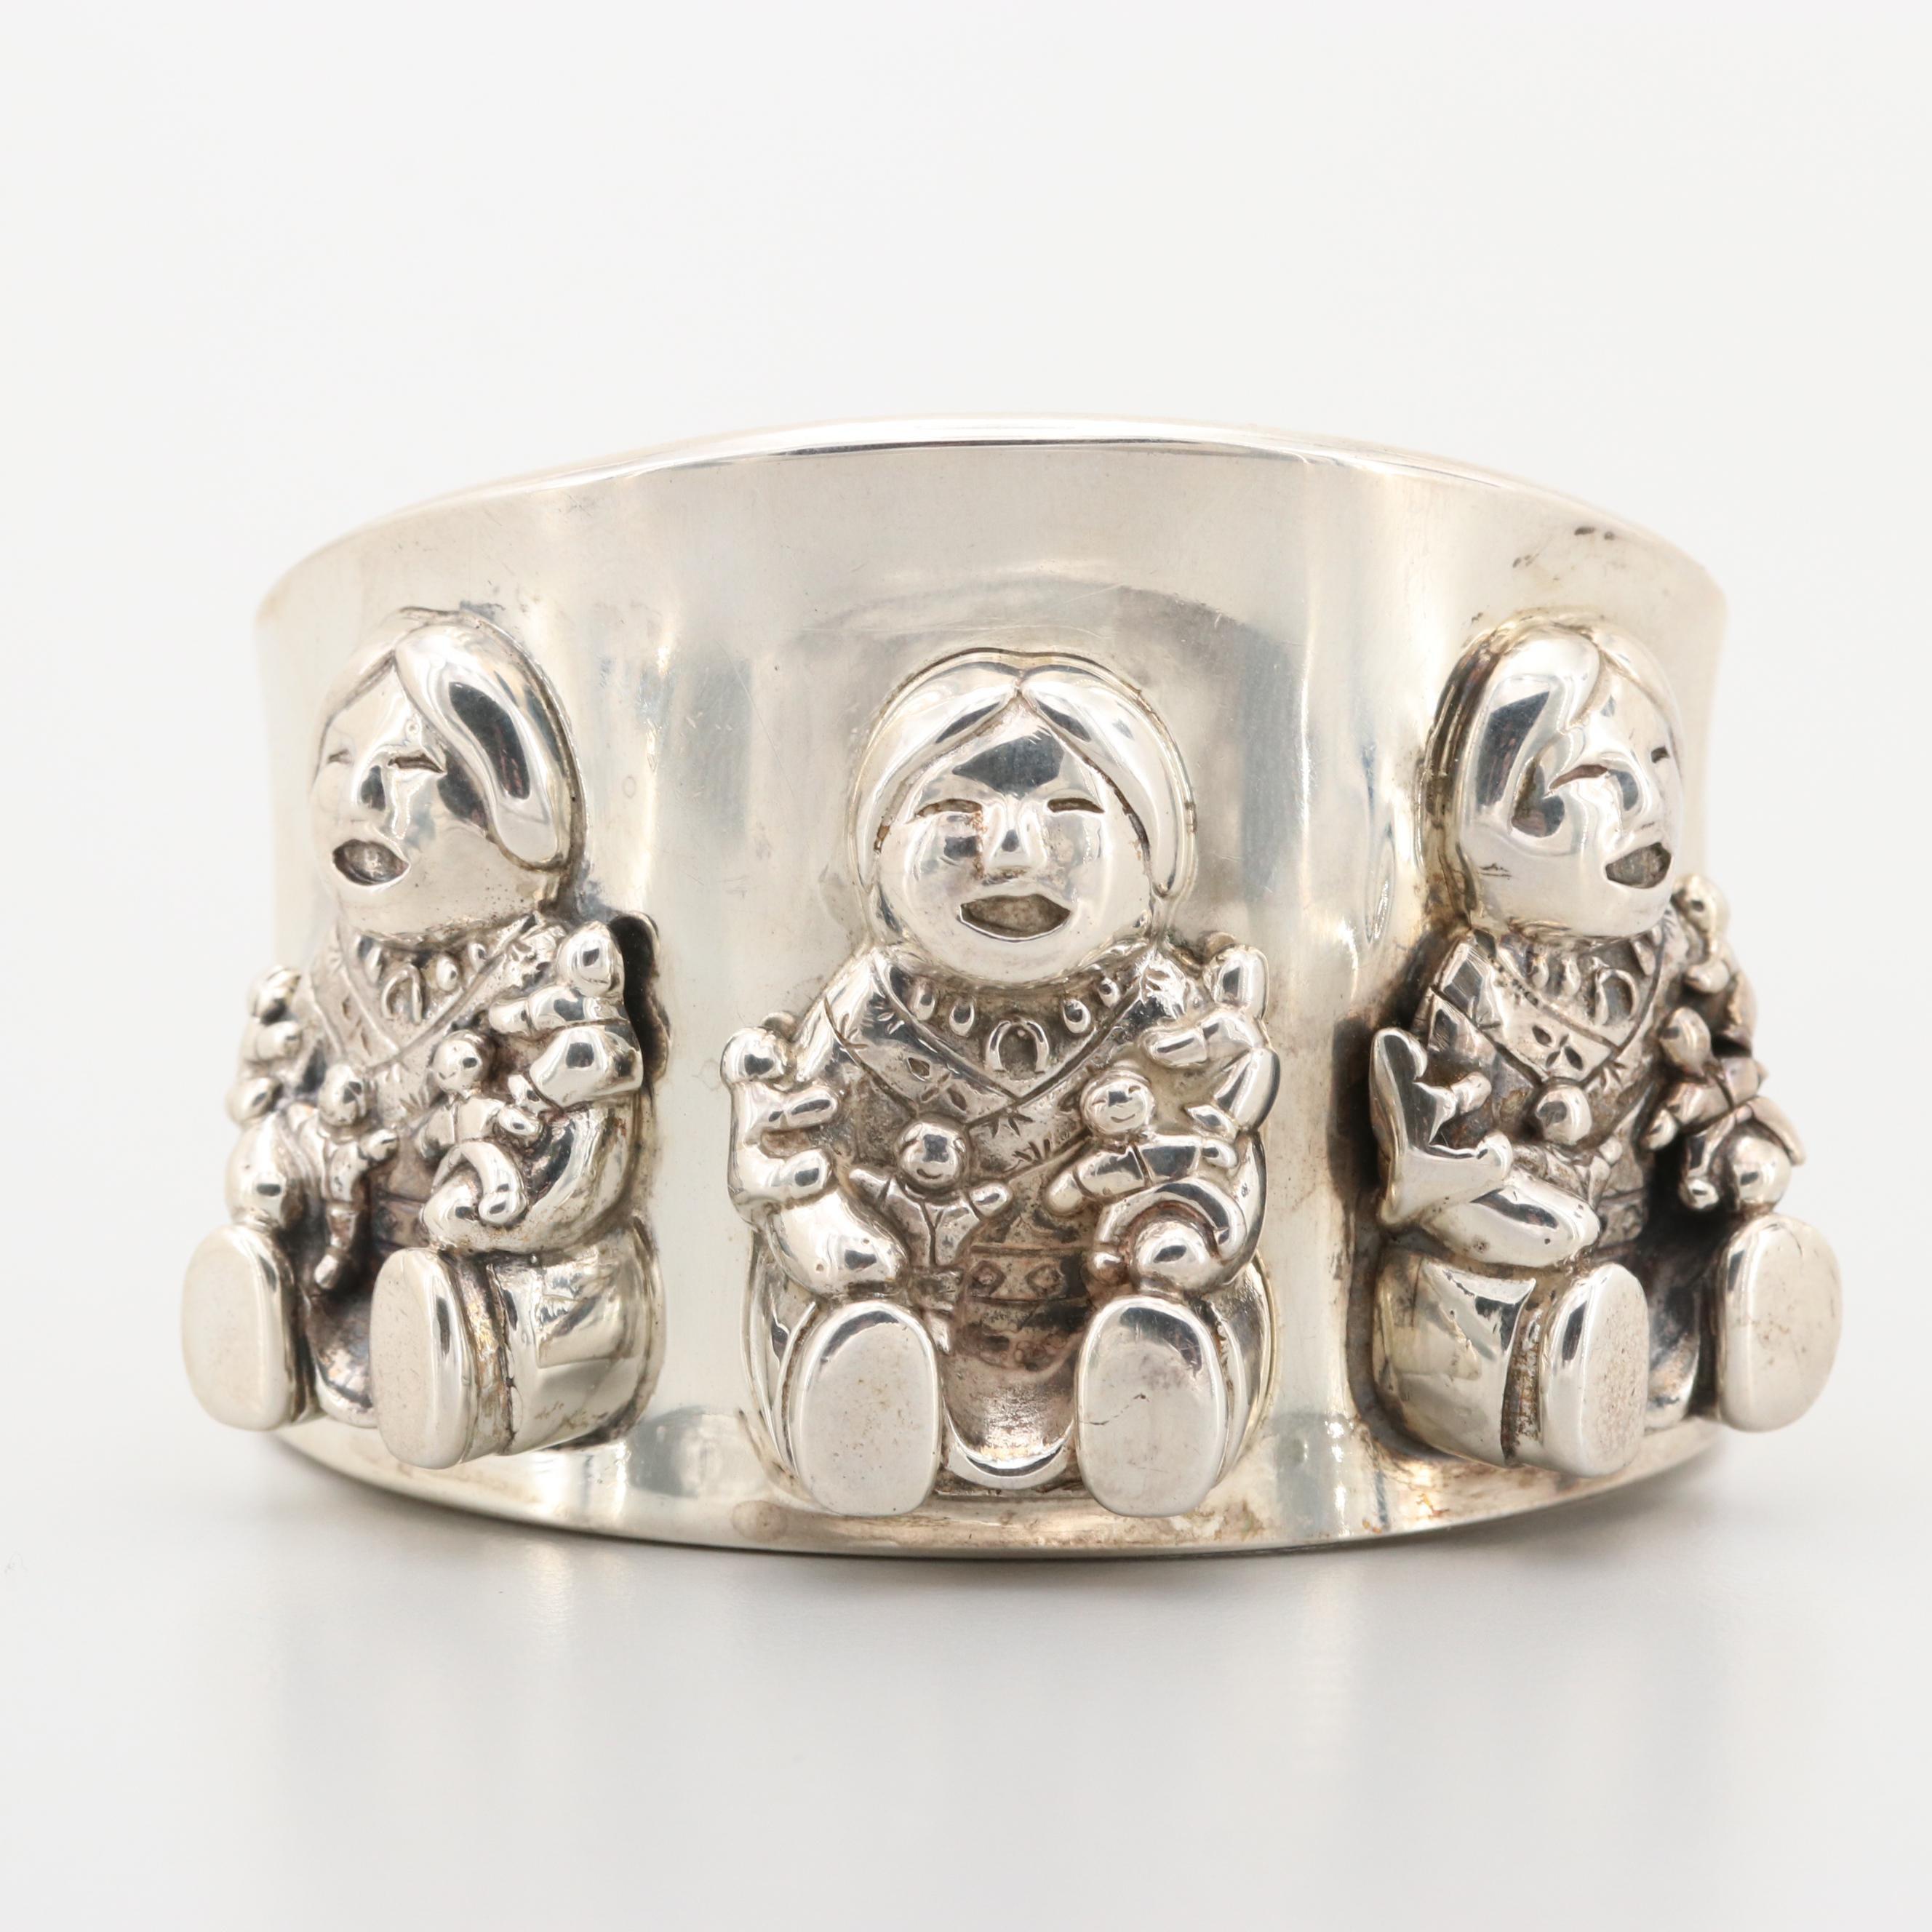 Sunrise Sterling Silver Cuff Bracelet